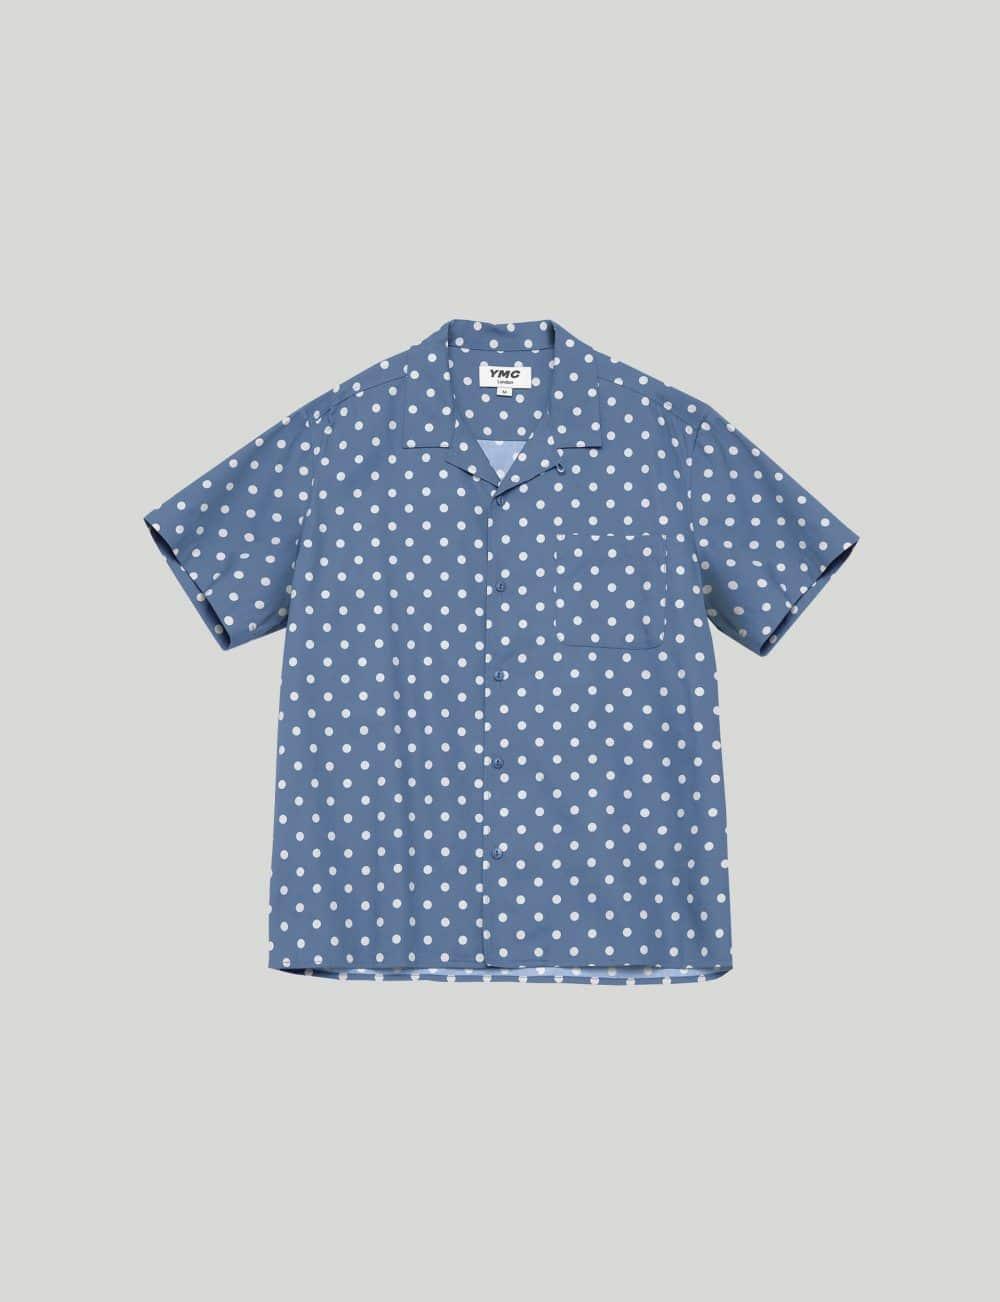 YMC - Castart - Malick Dot Print Shirt - blue